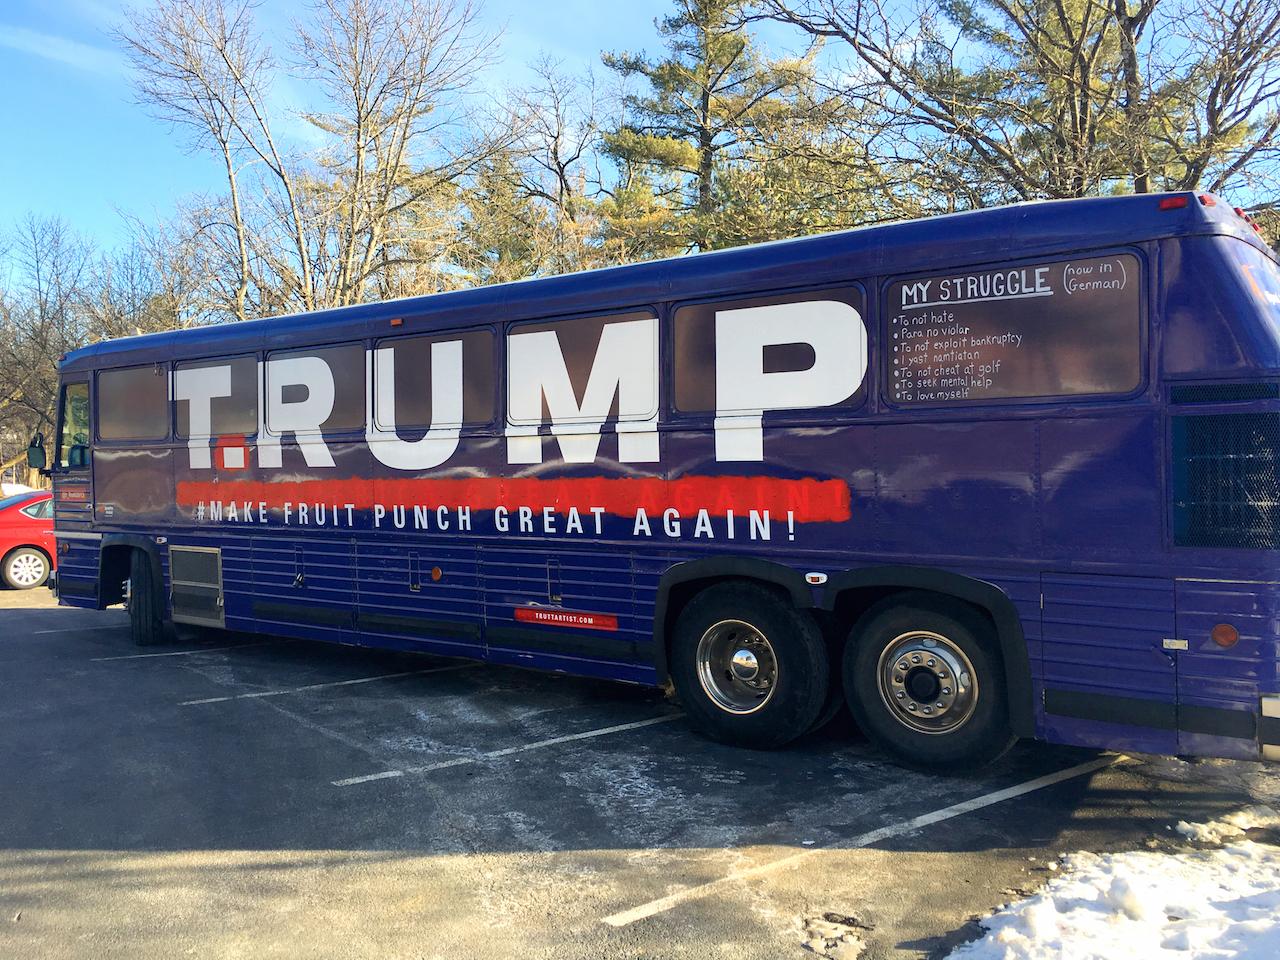 Artists Buy Trump Campaign Bus on Craigslist, Turn It Into ...